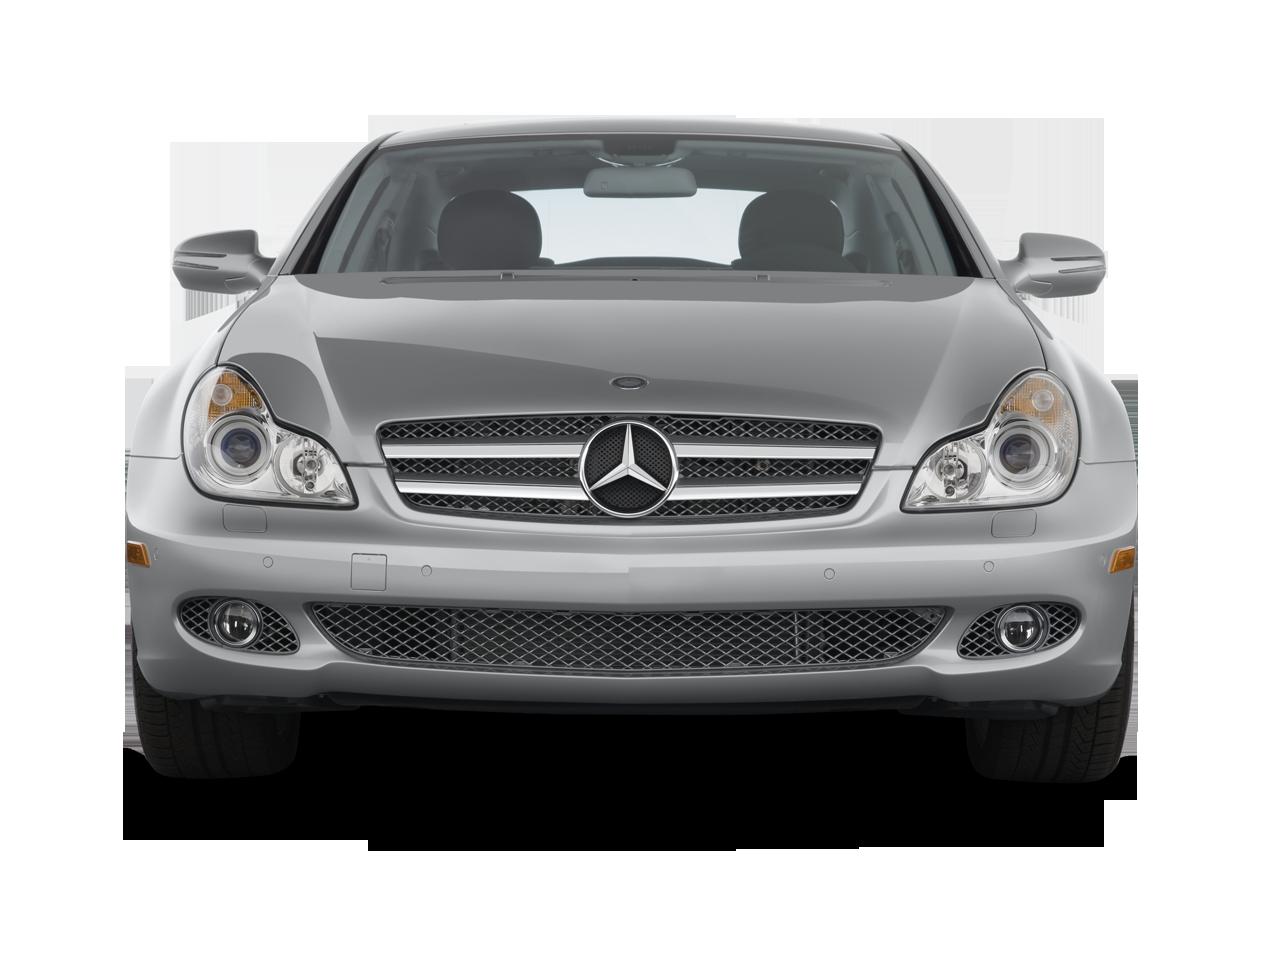 2009 mercedes benz cls550 mercedes benz luxury sedan automobile magazine. Black Bedroom Furniture Sets. Home Design Ideas